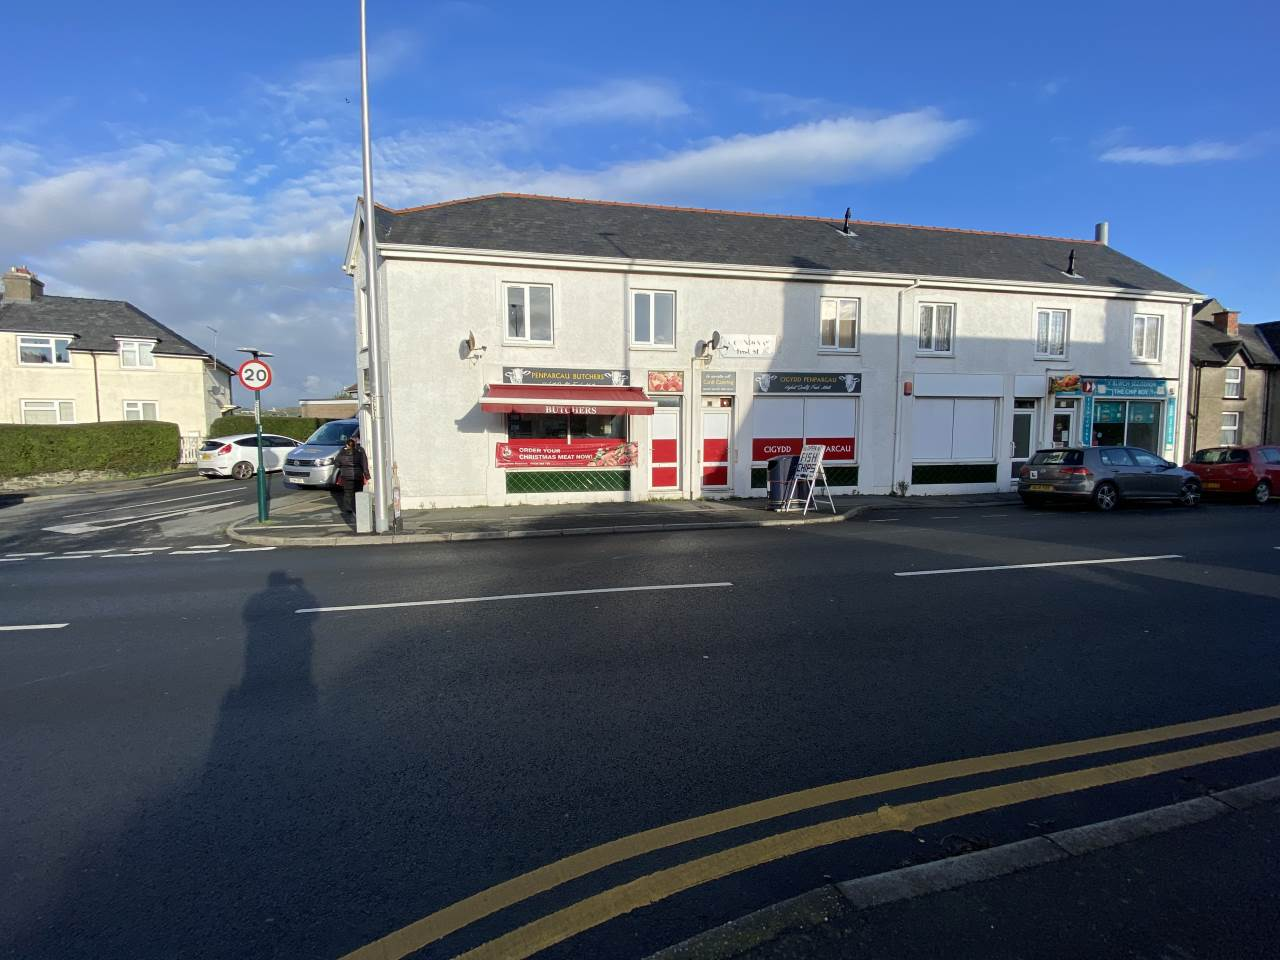 1 bed studio flat to rent in Penparcau, Aberystwyth, SY23